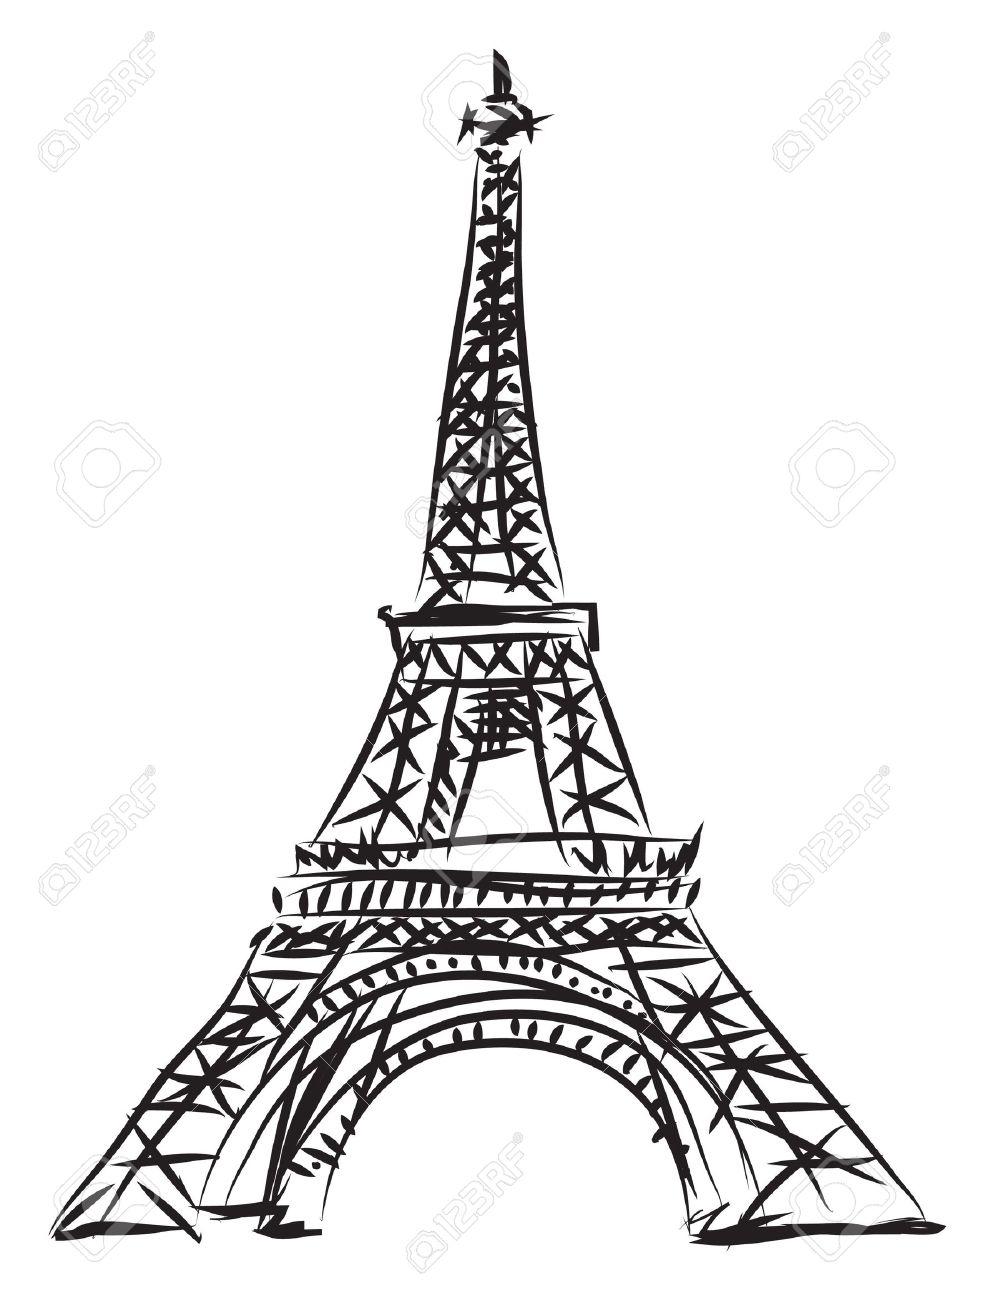 995x1300 Eiffel Tower Drawing Black And White Eiffel Tower, Paris, France